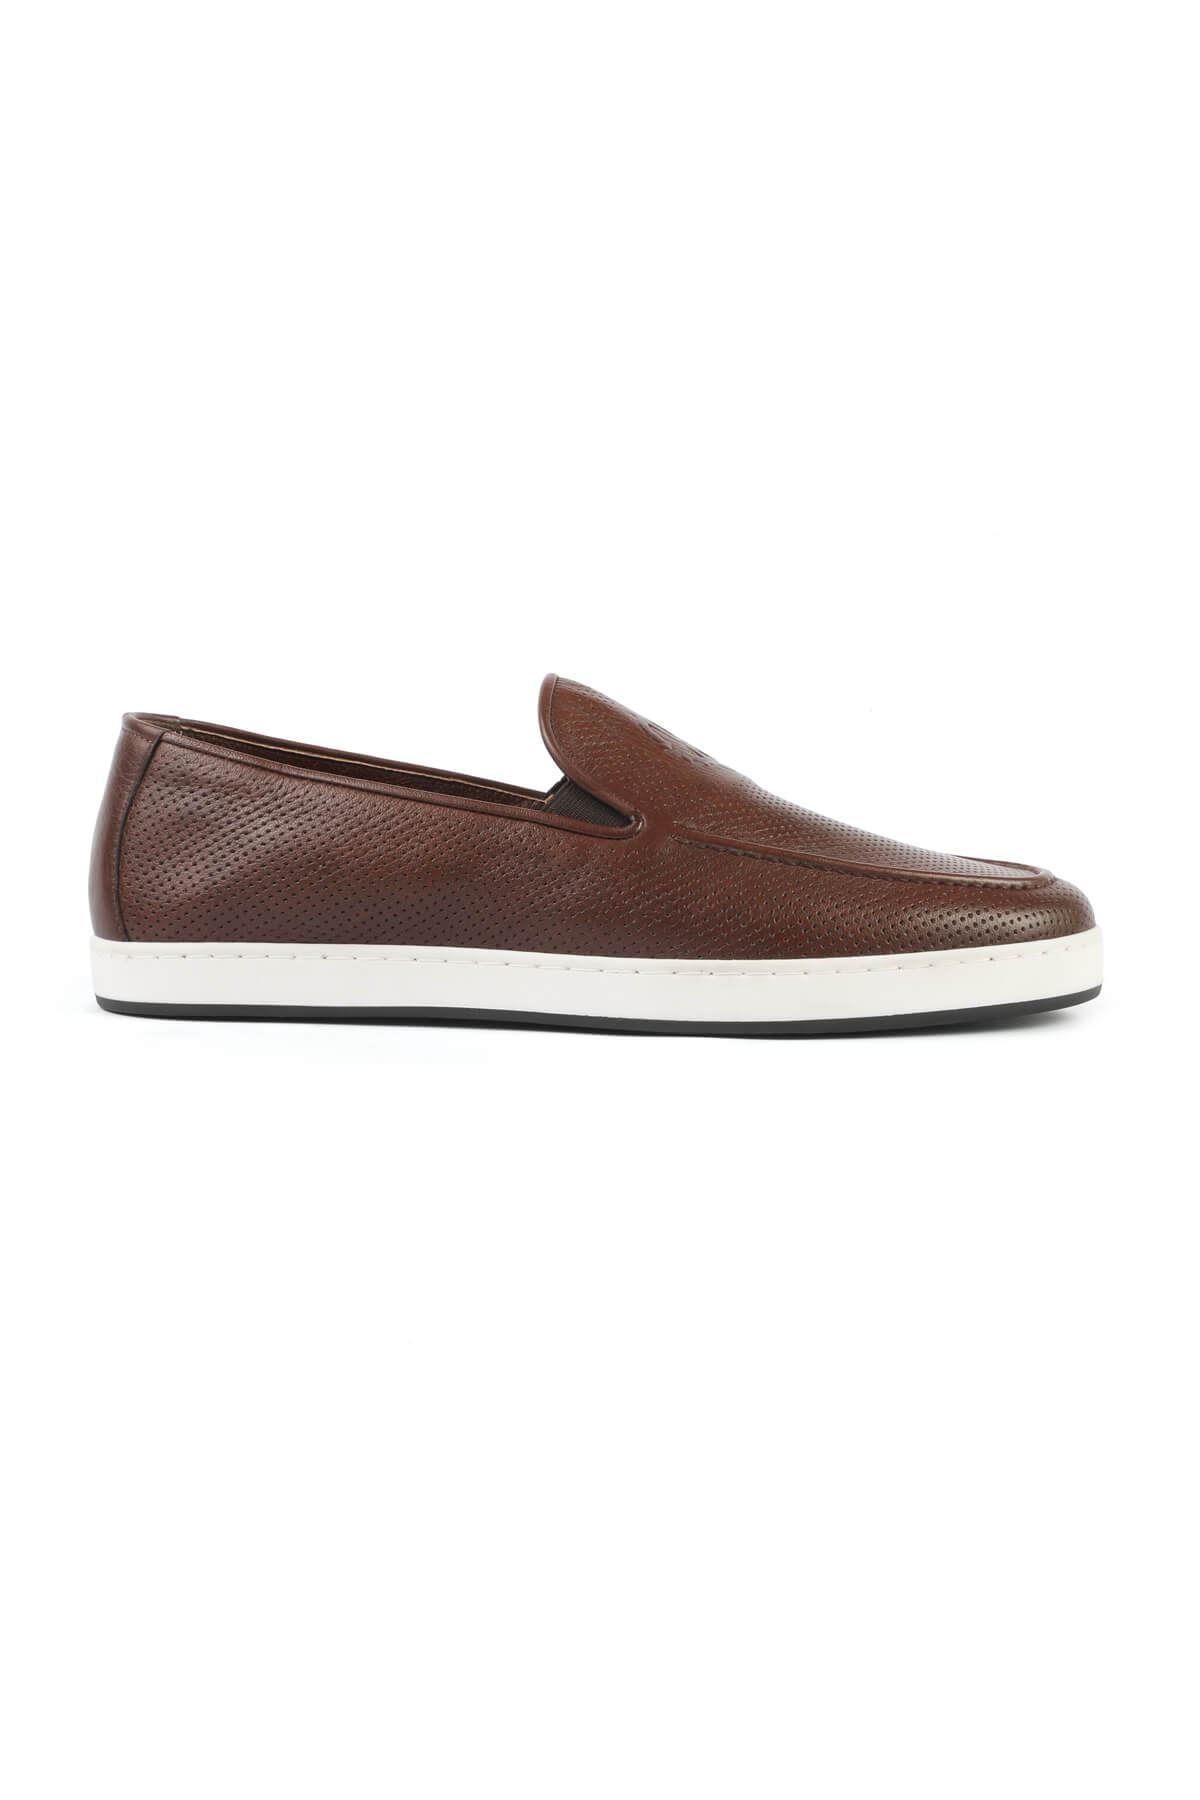 Libero 3193 Kahve Loafer Ayakkabı